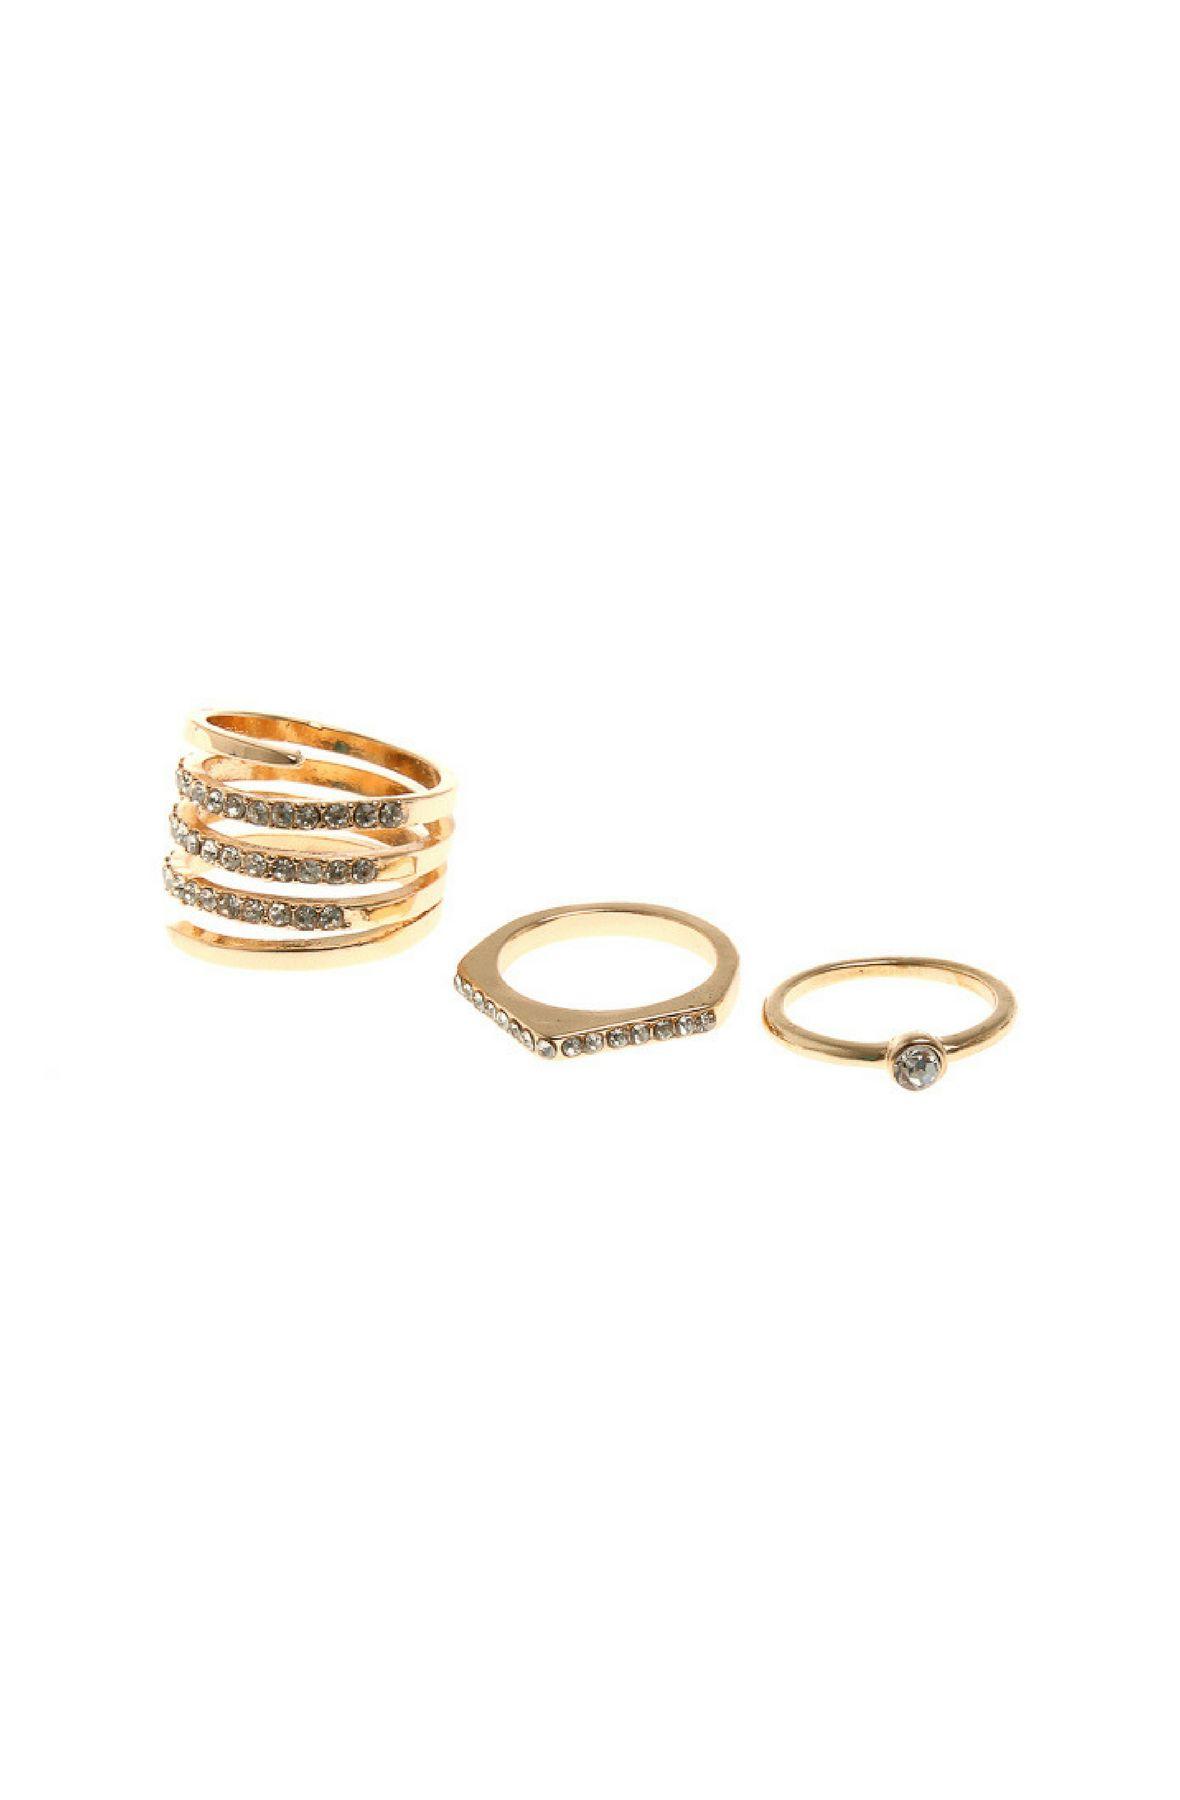 Image of 3 Piece Statement Ring Set